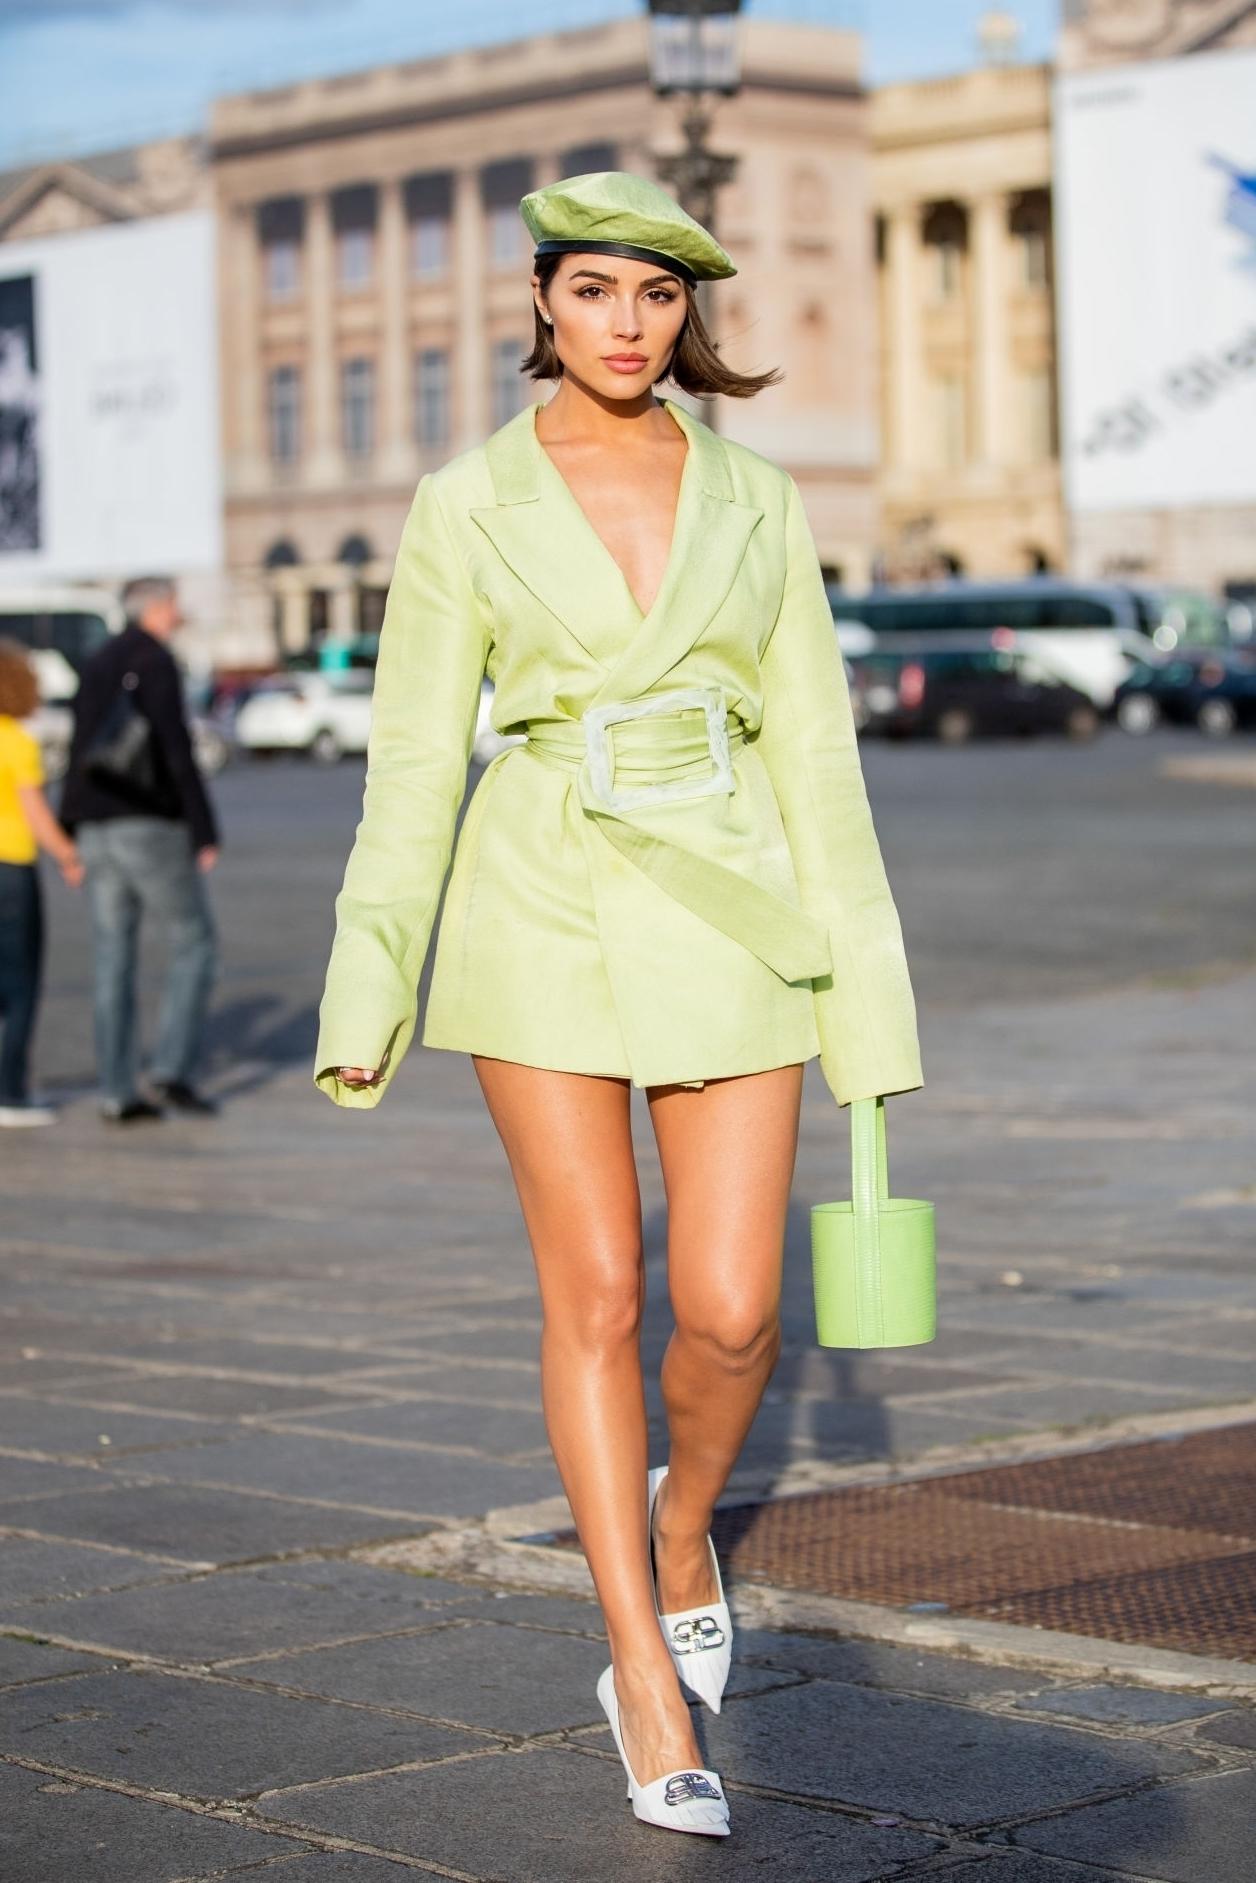 Paris-Georgia Top 10 Fashion Brands Rising in 2021